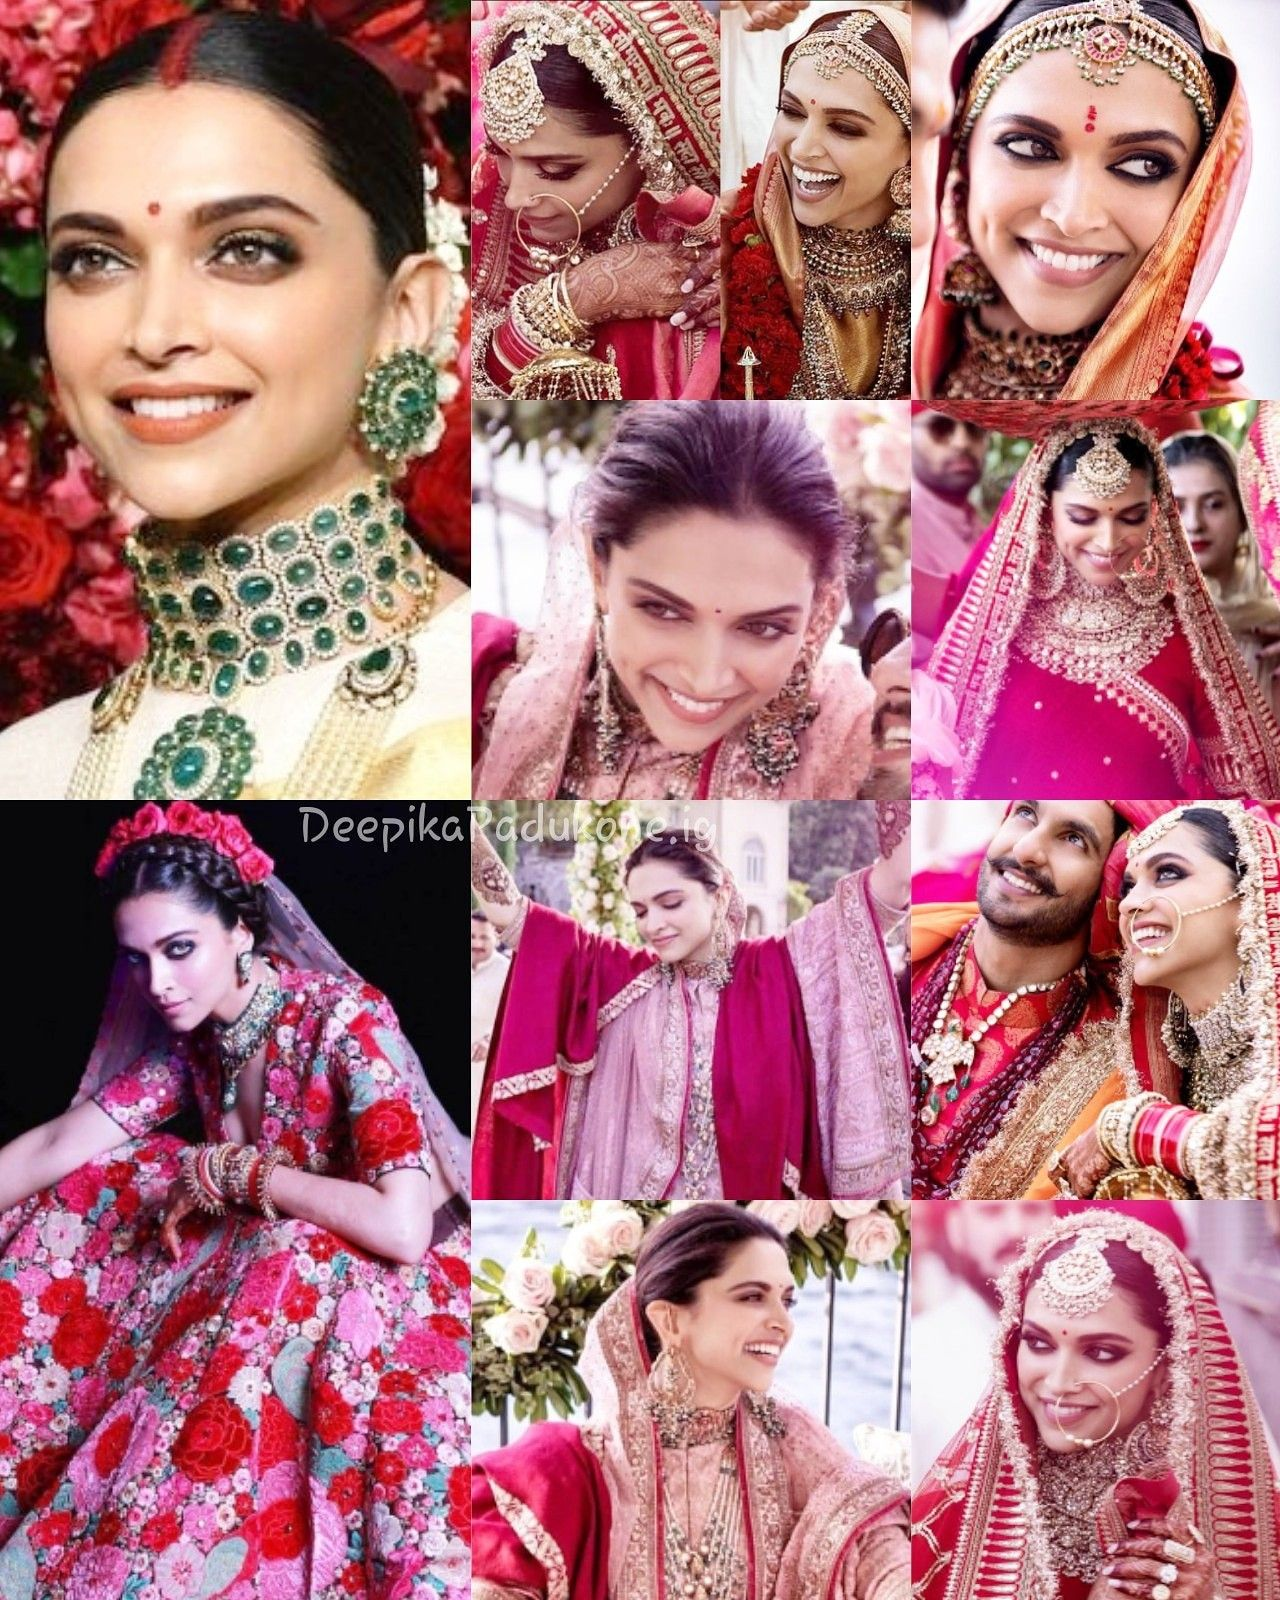 Beautifulbride Deepika Padukone Deepika Padukone Style Indian Wedding Photography Bollywood Celebrities